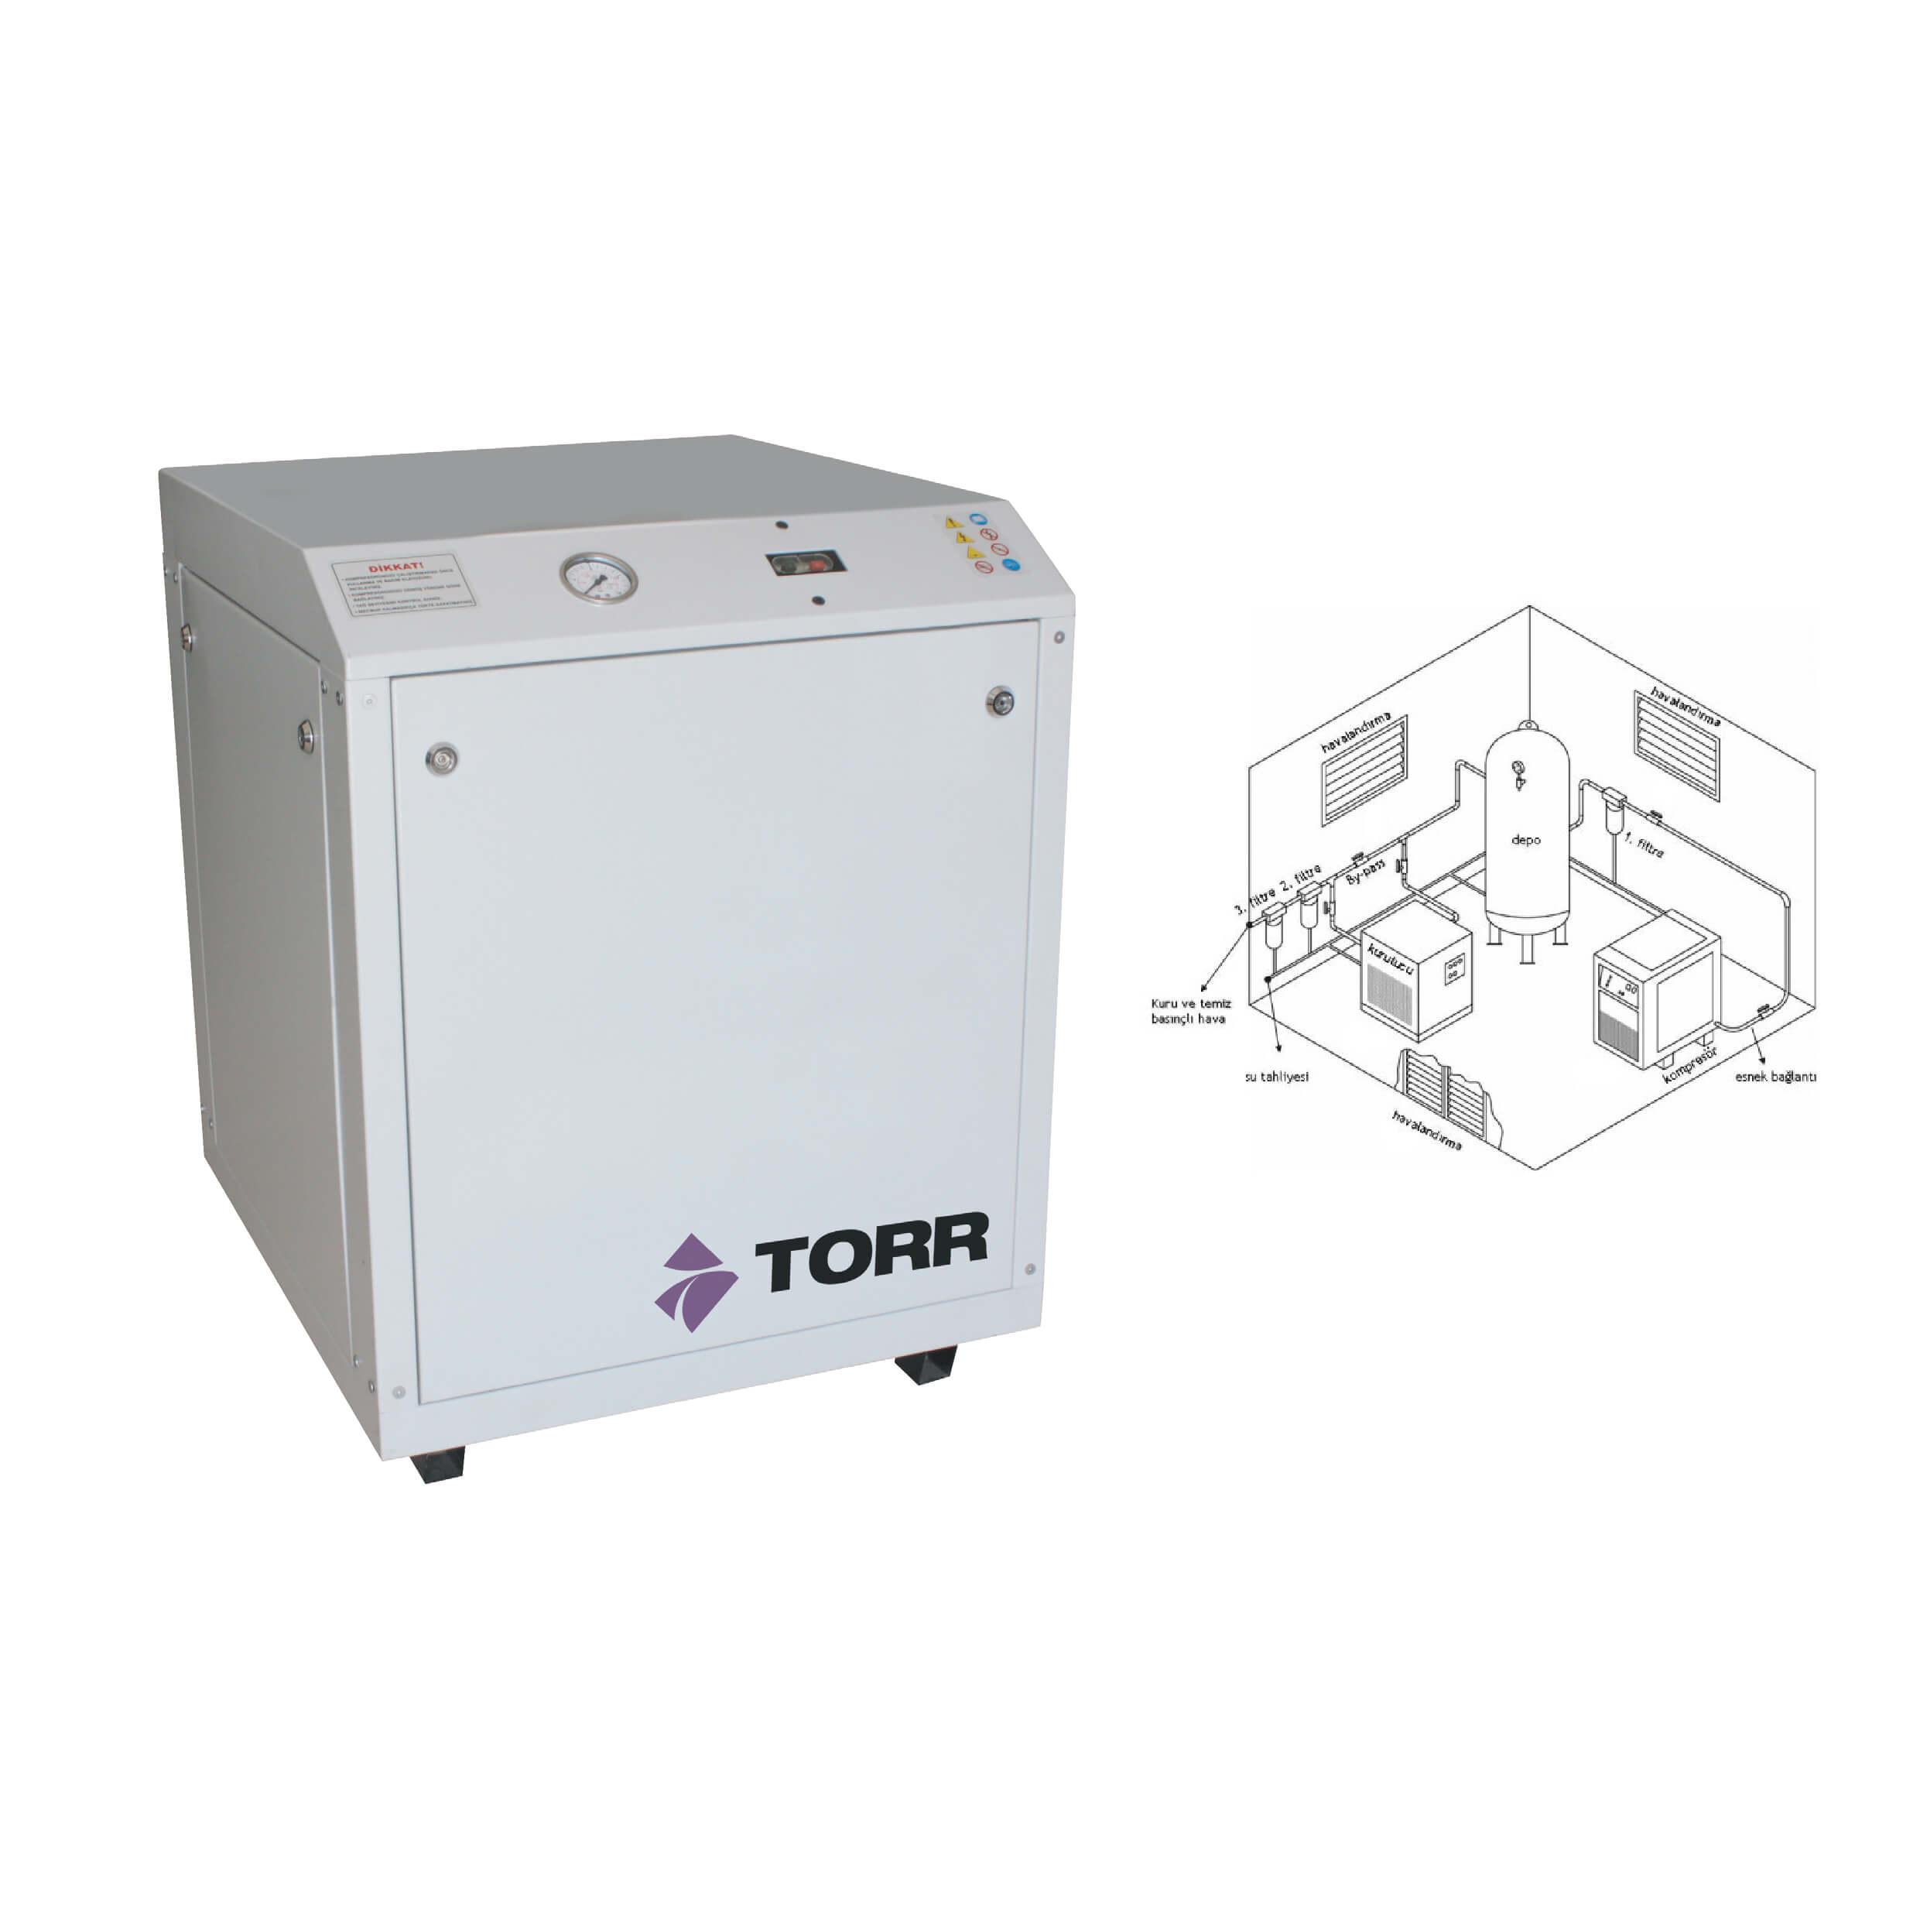 Torr Silent Sessiz Hava Kompresörü-01